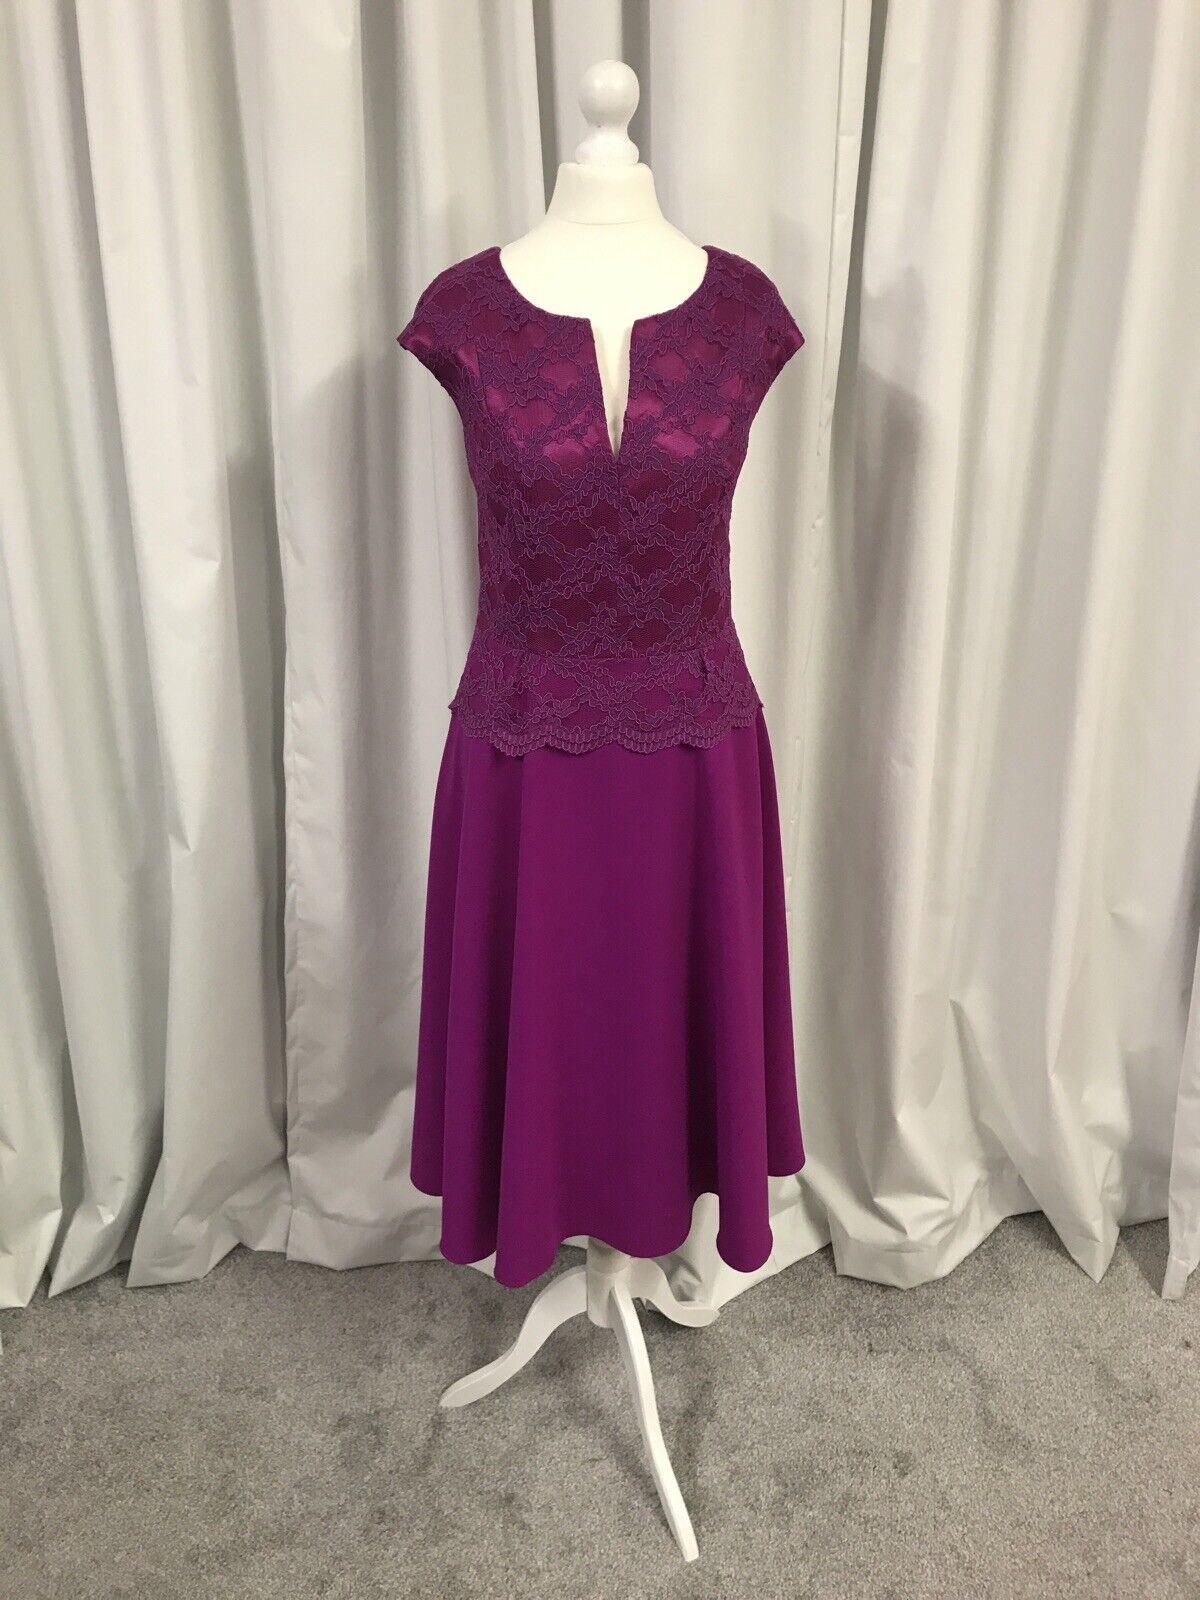 Aideen Bodkin Mother Of The Bride/Groom Massive Clearance Dress UK12, Magenta